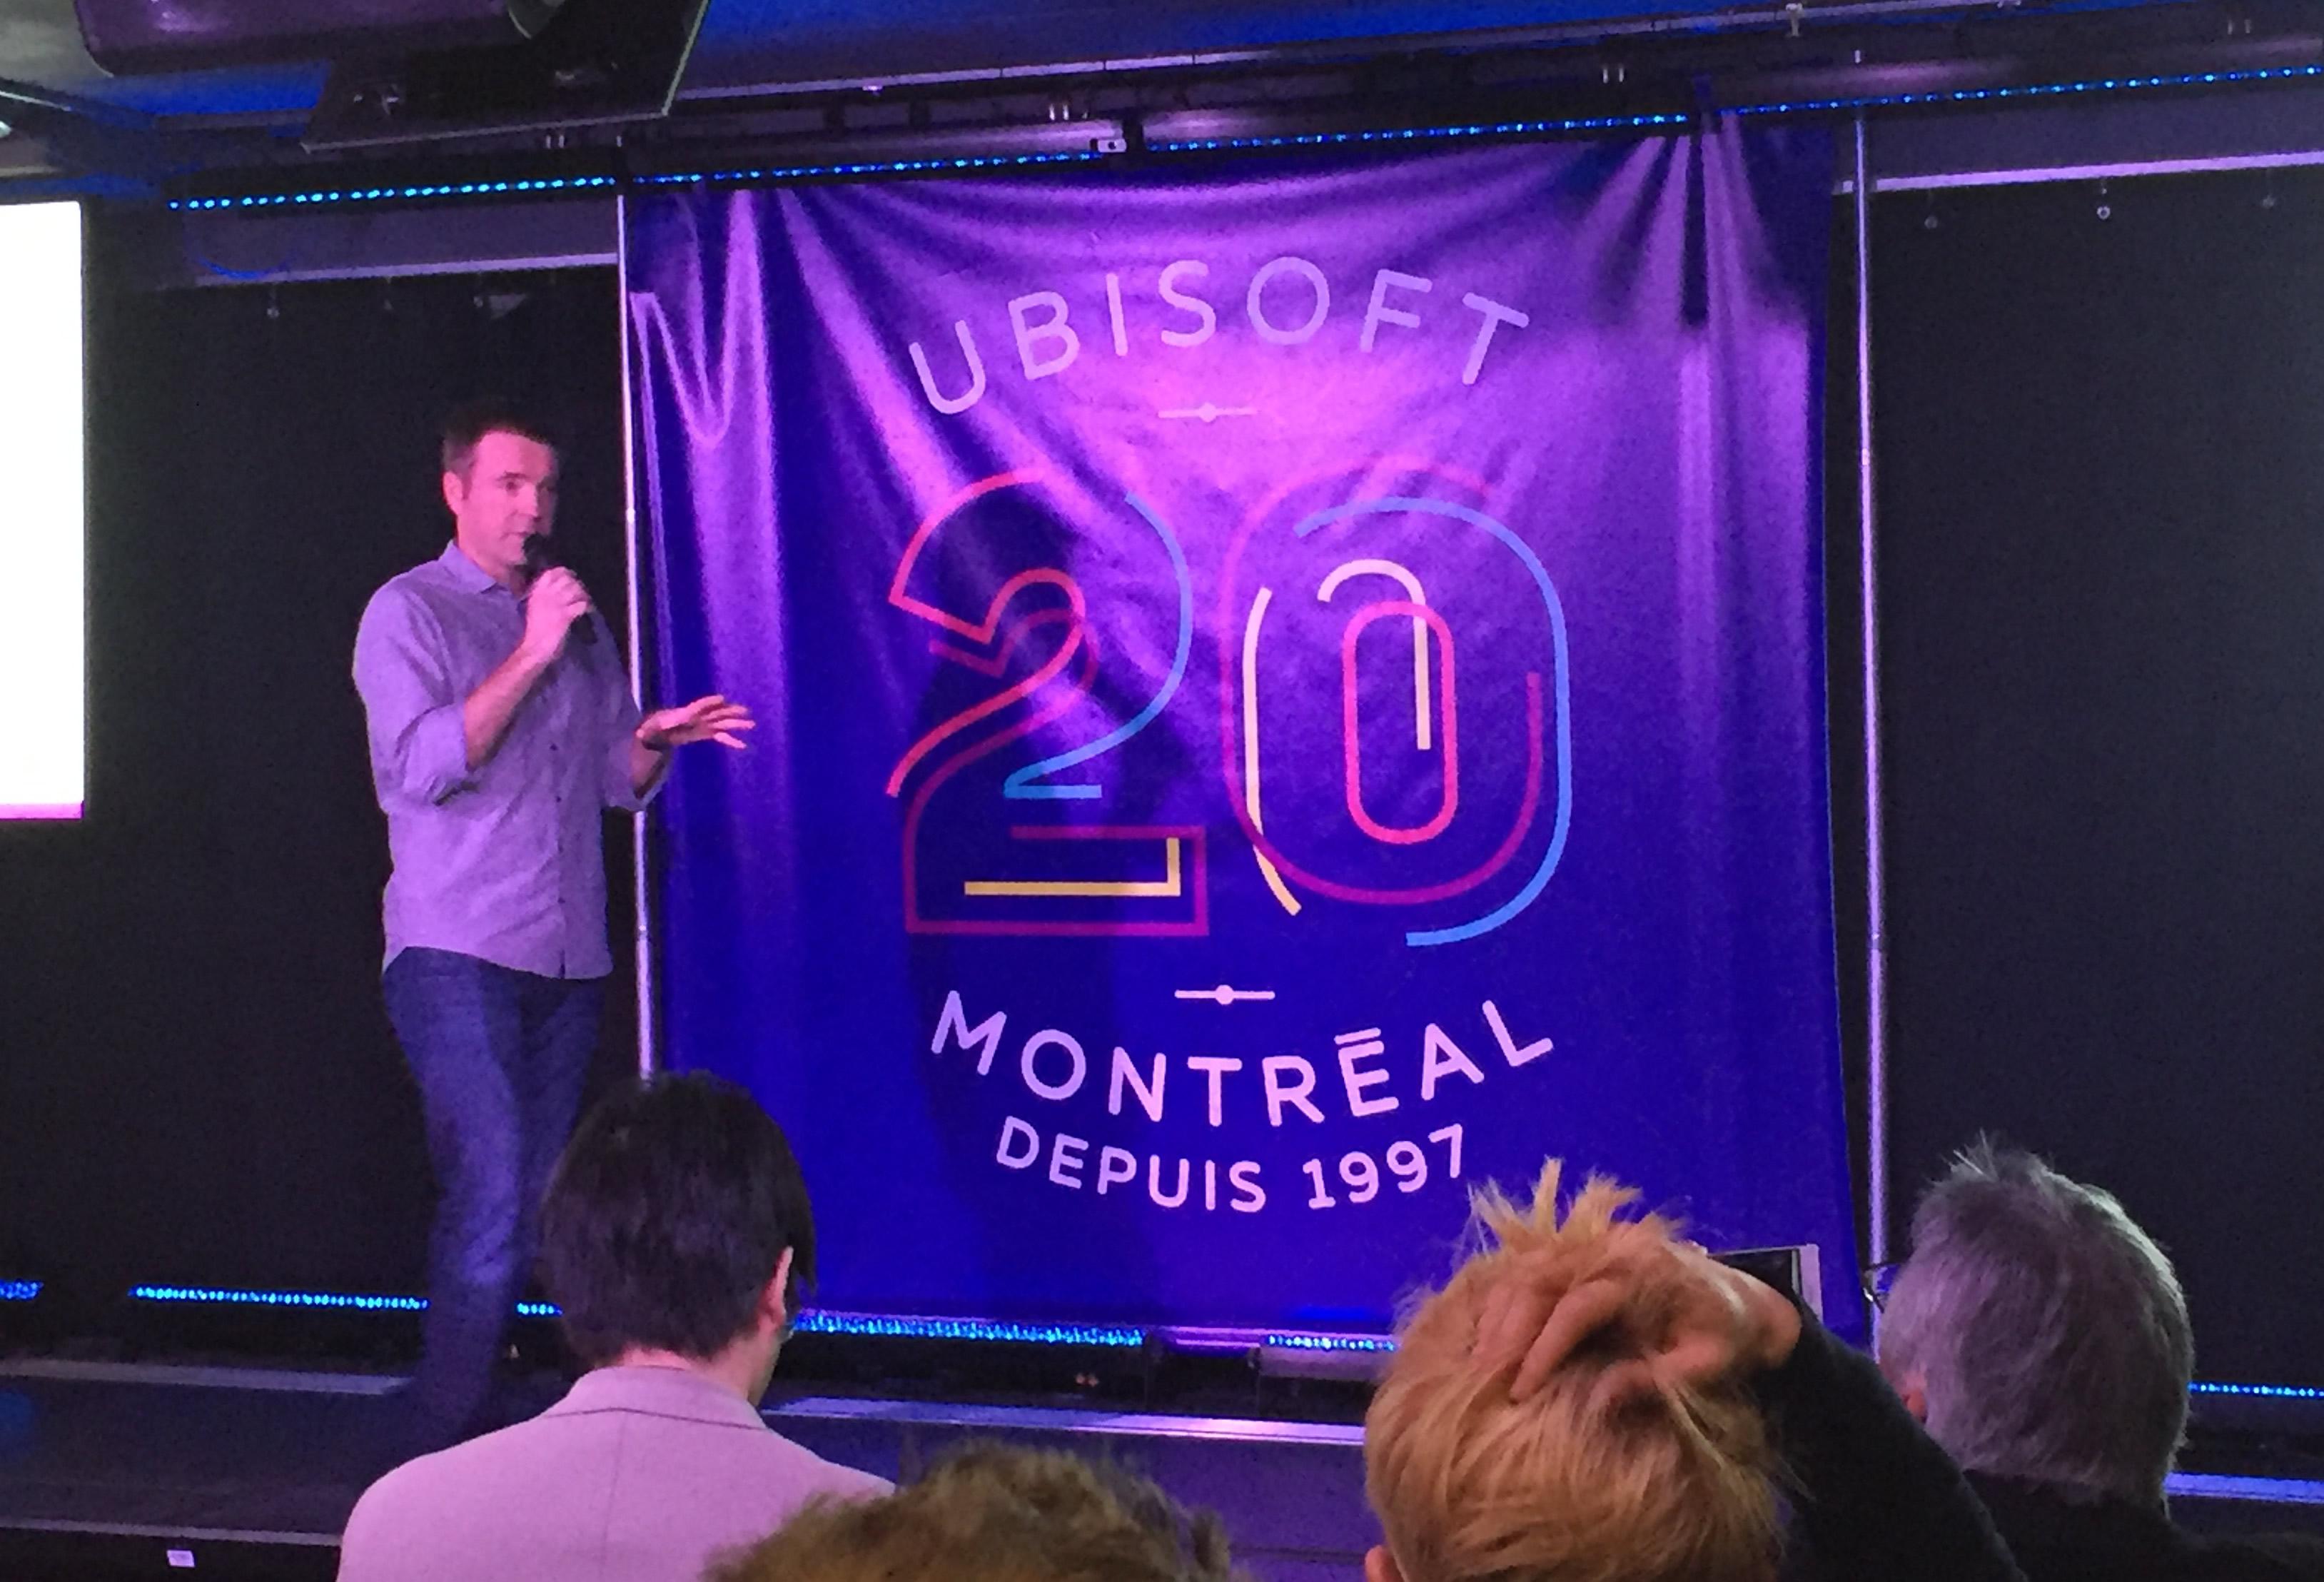 Yannis Mallat, CEO of Ubisoft Montréal, outlined the company's progress since its arrival in Montréal.